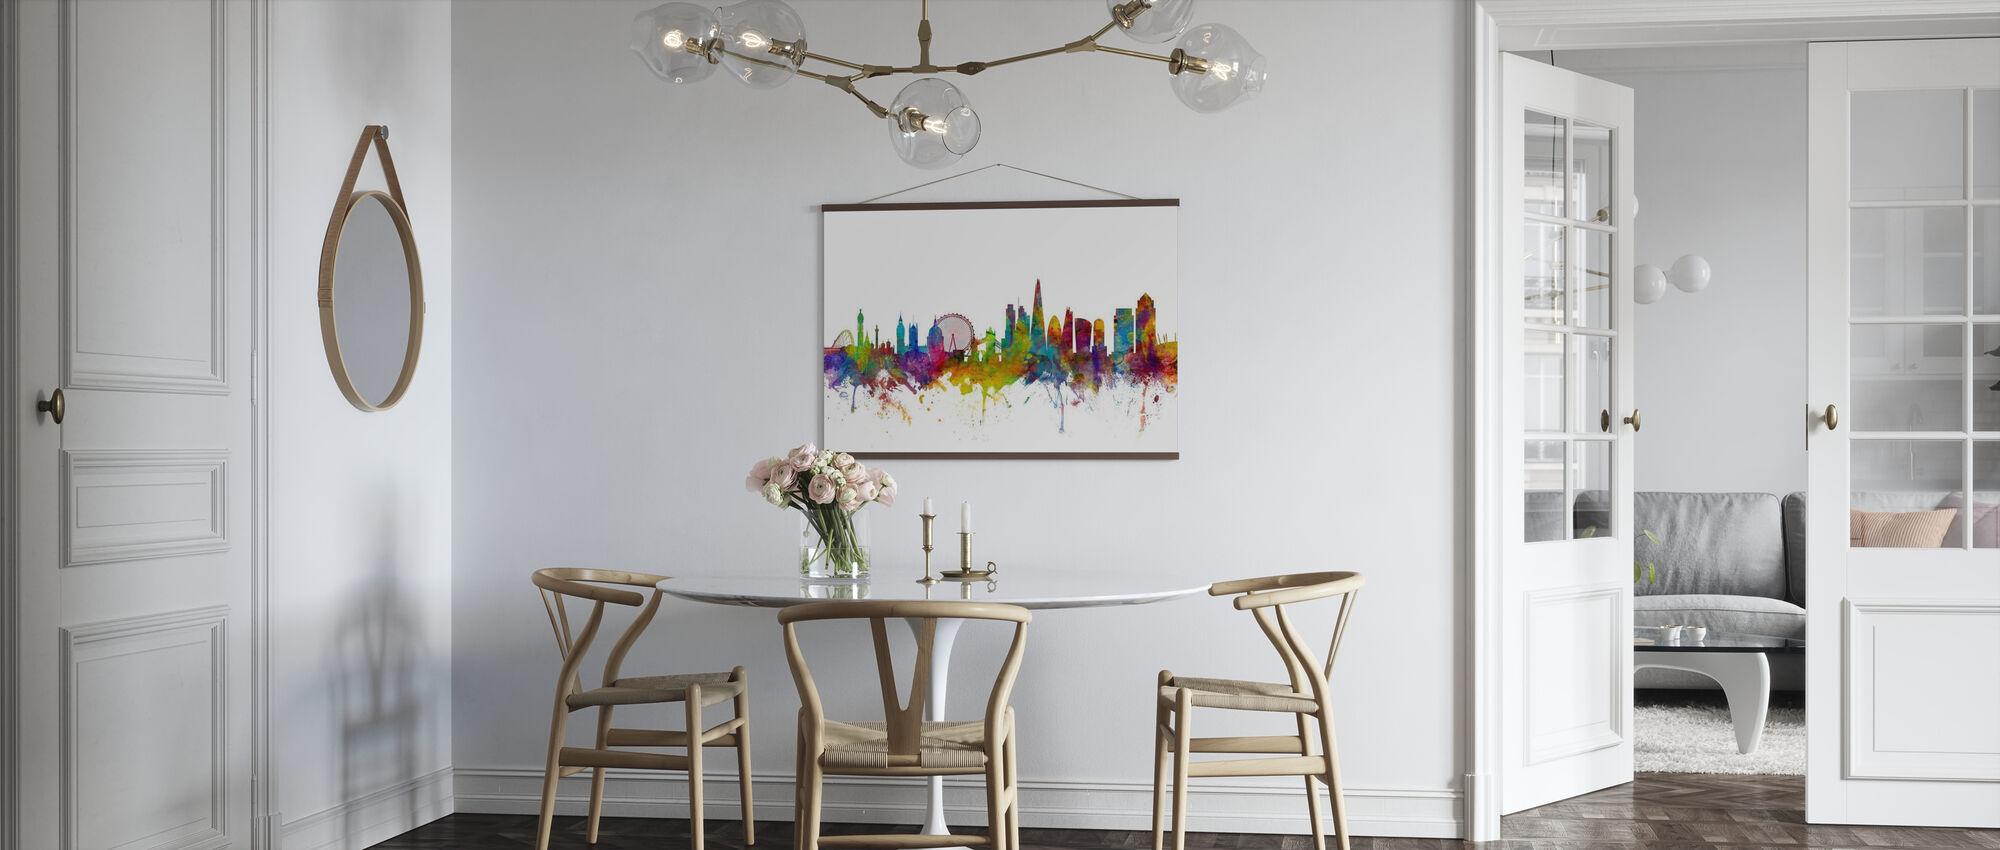 London Canary Wharf skyline - Poster - Keuken